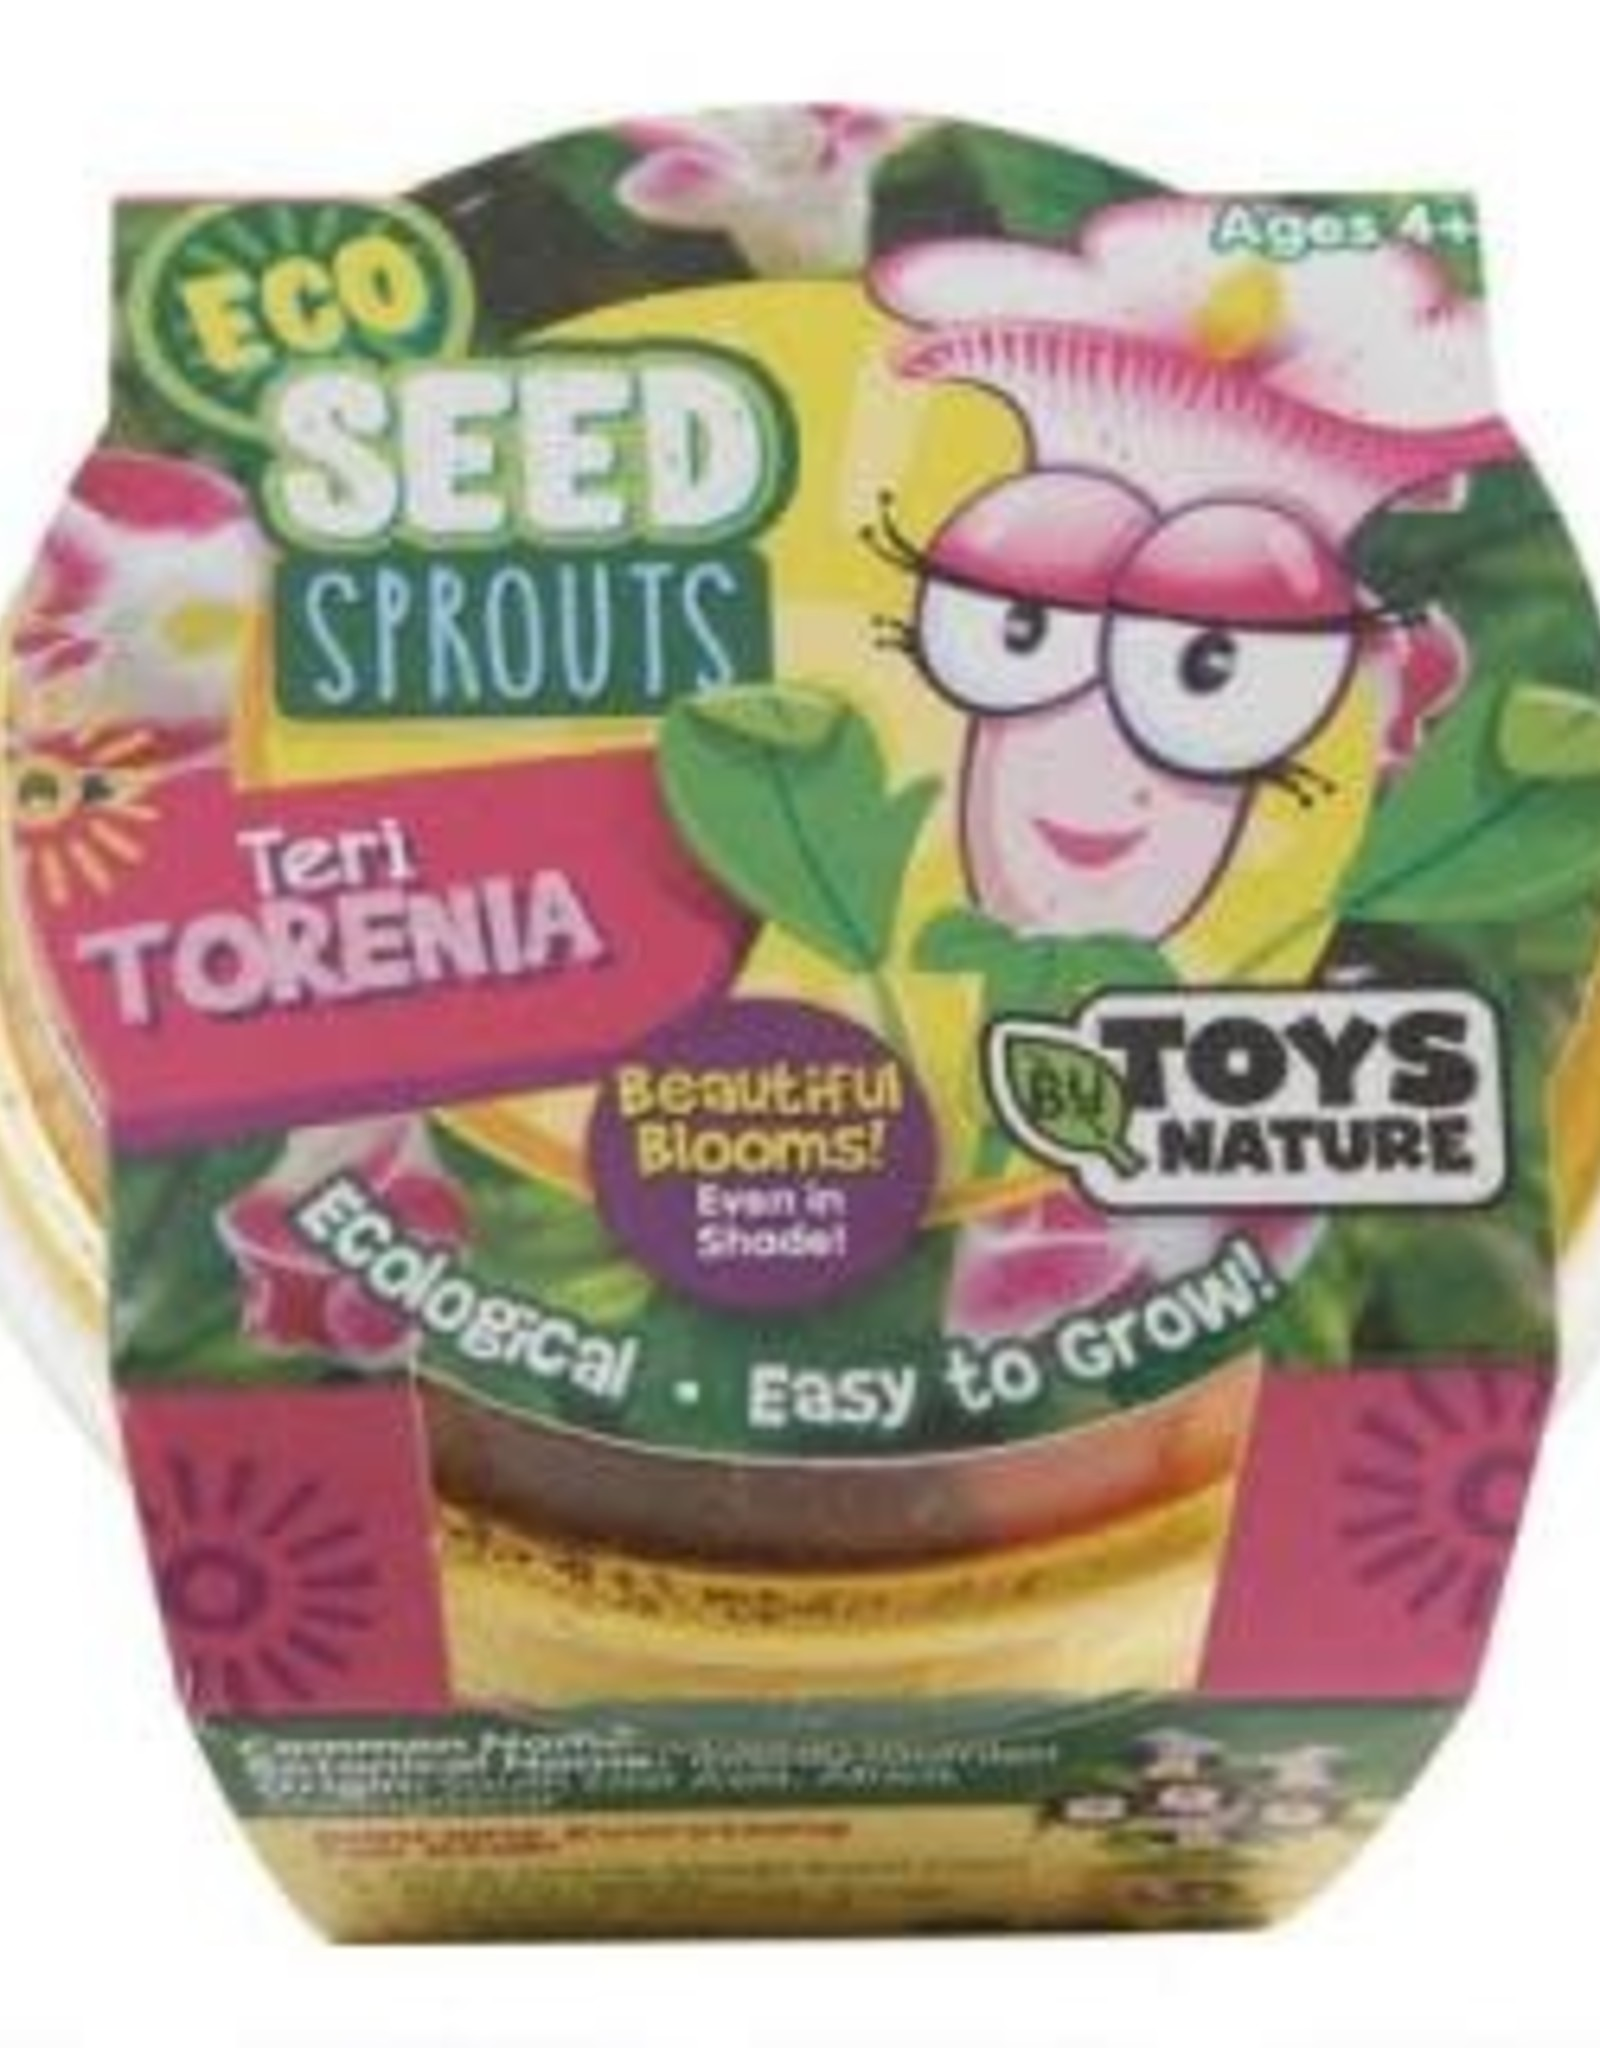 Eco Seed Sprouts-Teri Torenia